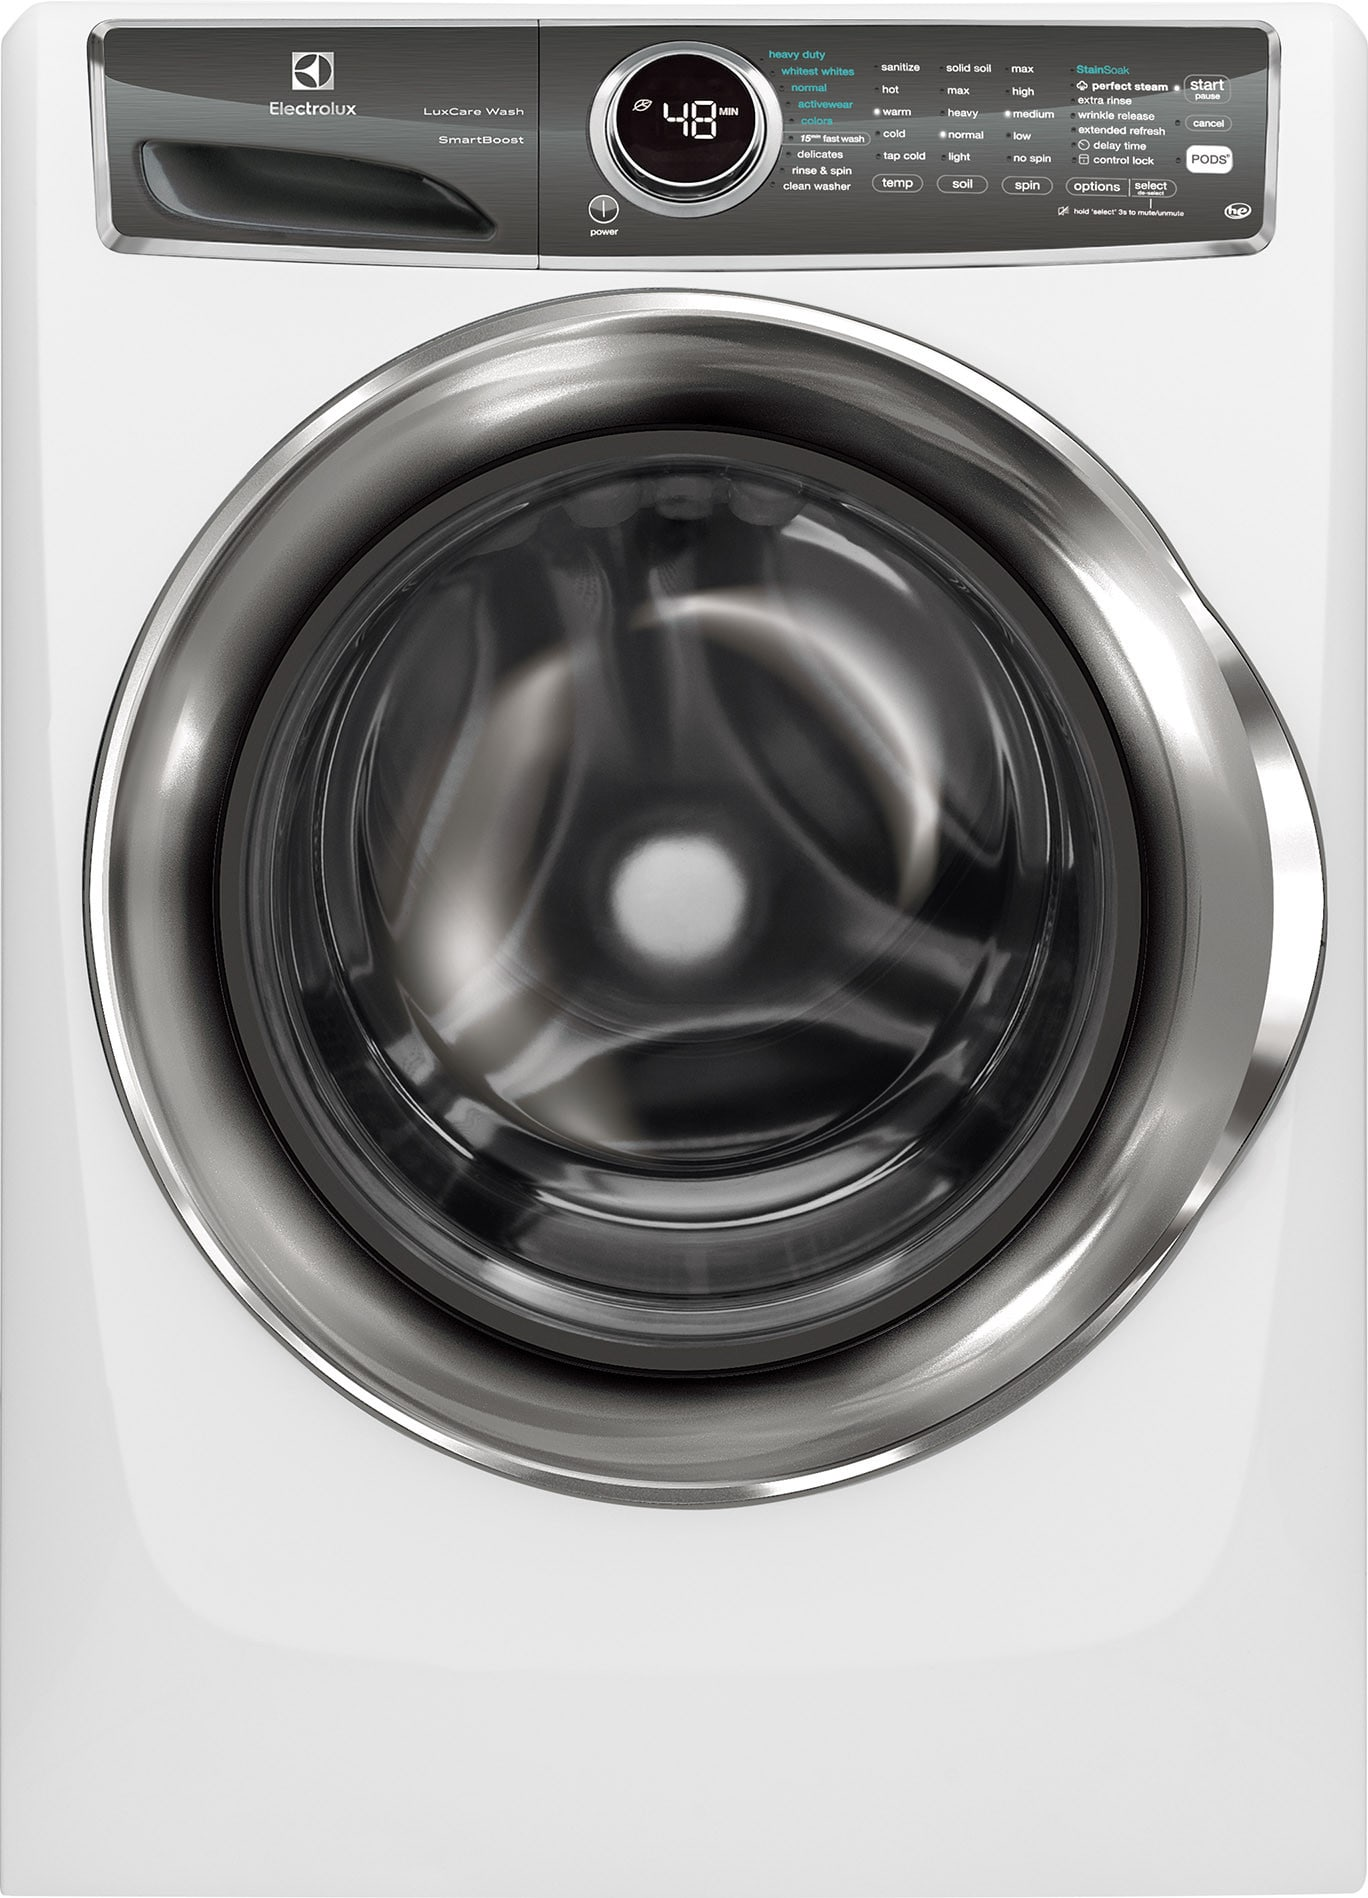 electrolux dryer electric w wpedestal main washer pedestal drawers